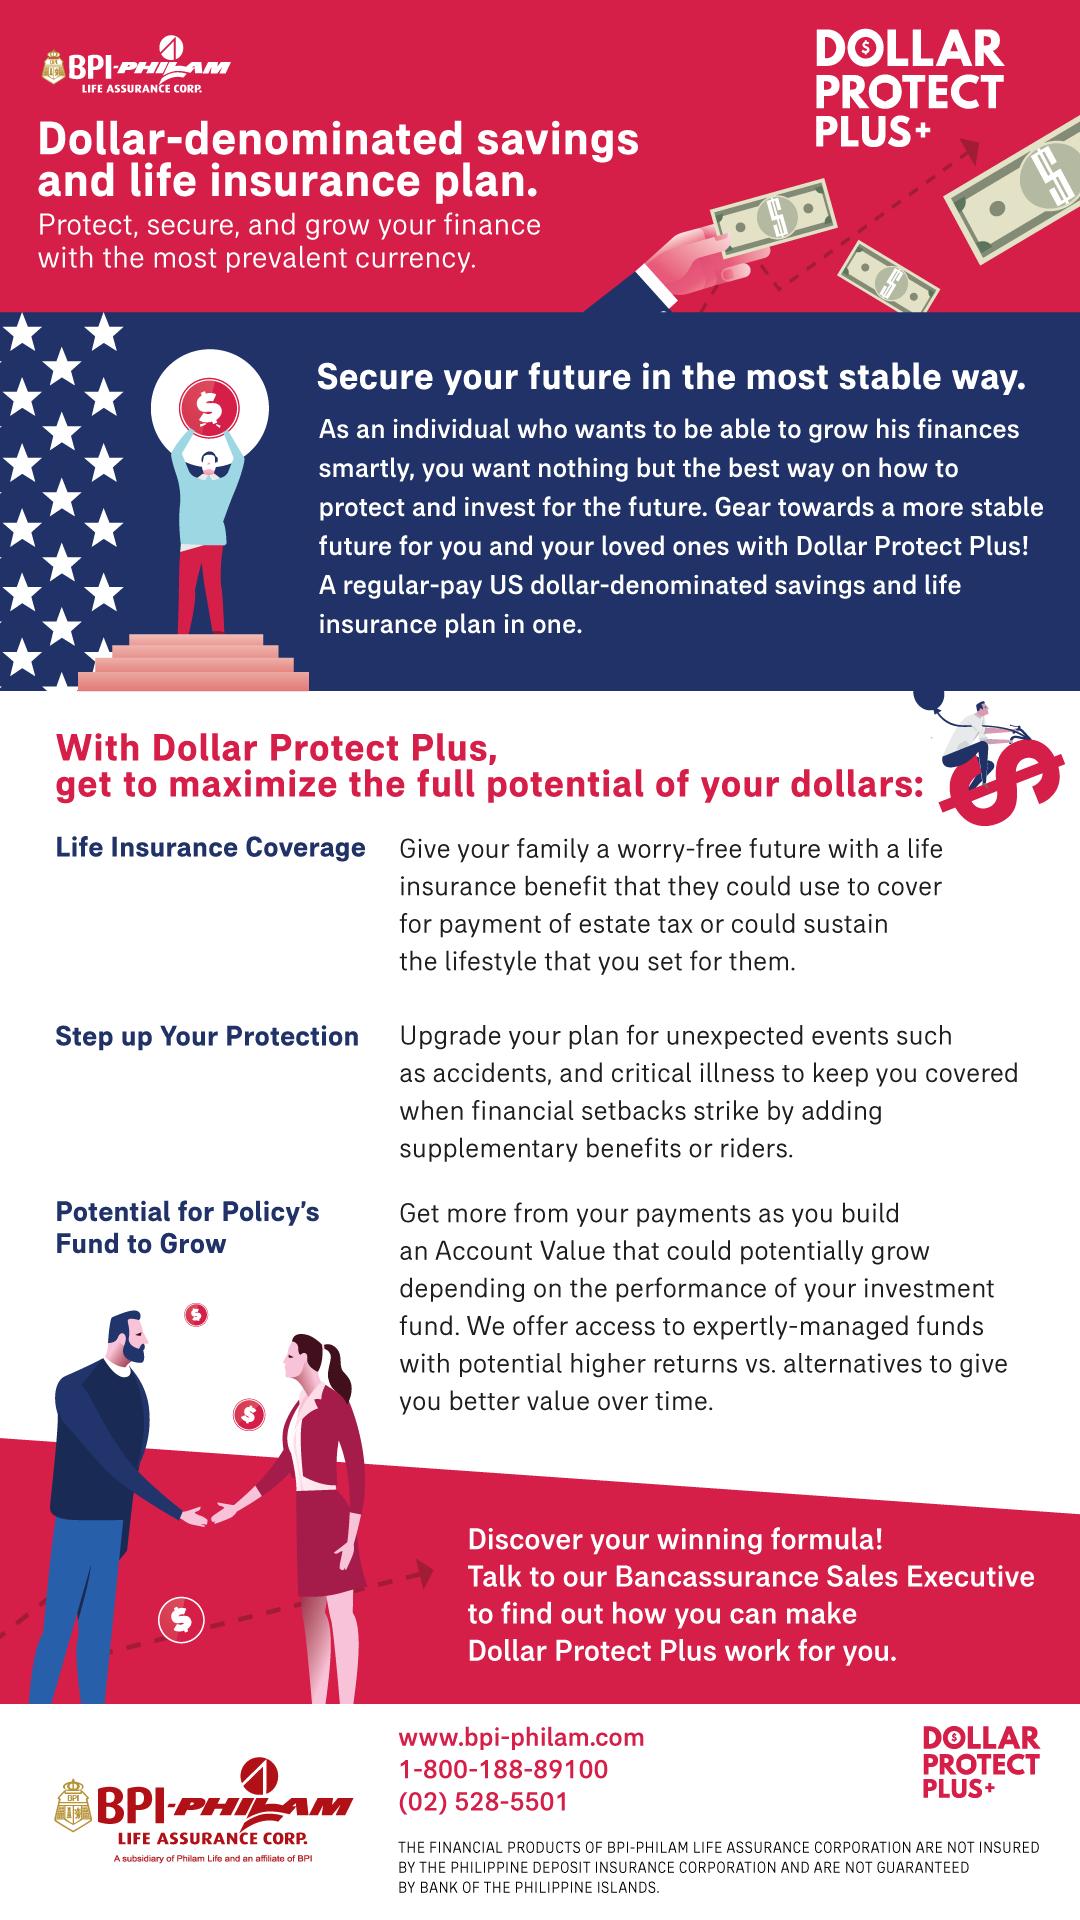 Dollar Life Insurance and Savings - Dollar Protect Plus ...